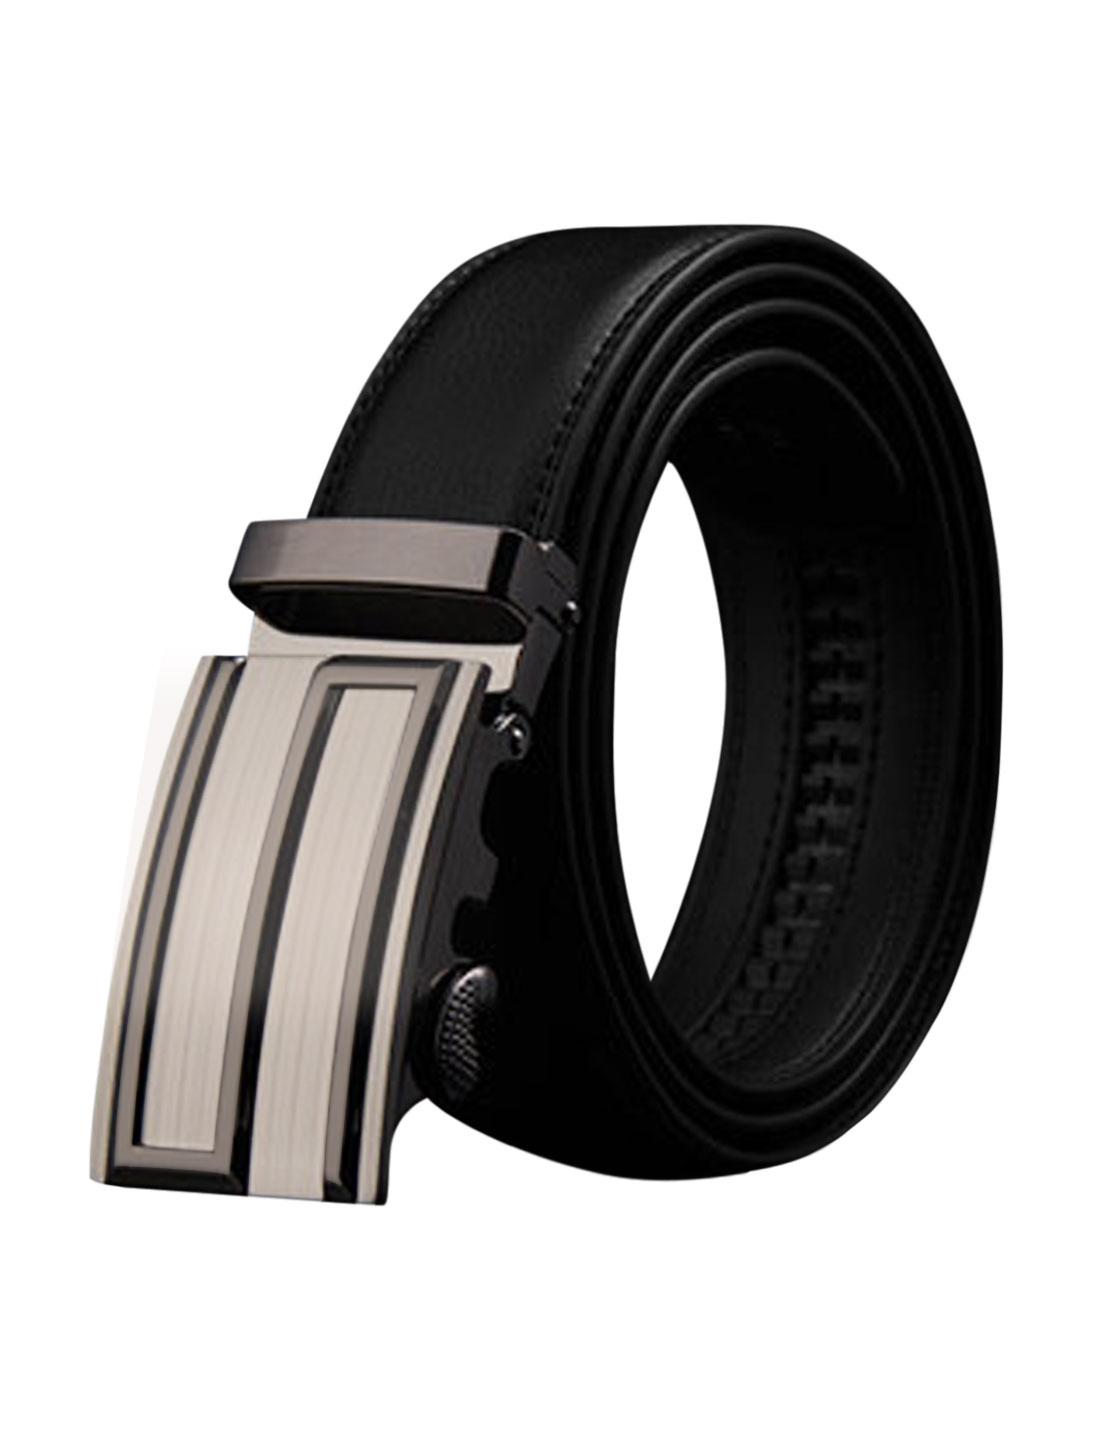 Man Automatic Buckle Holeless Stitched PU Ratchet Belt Black 125CM